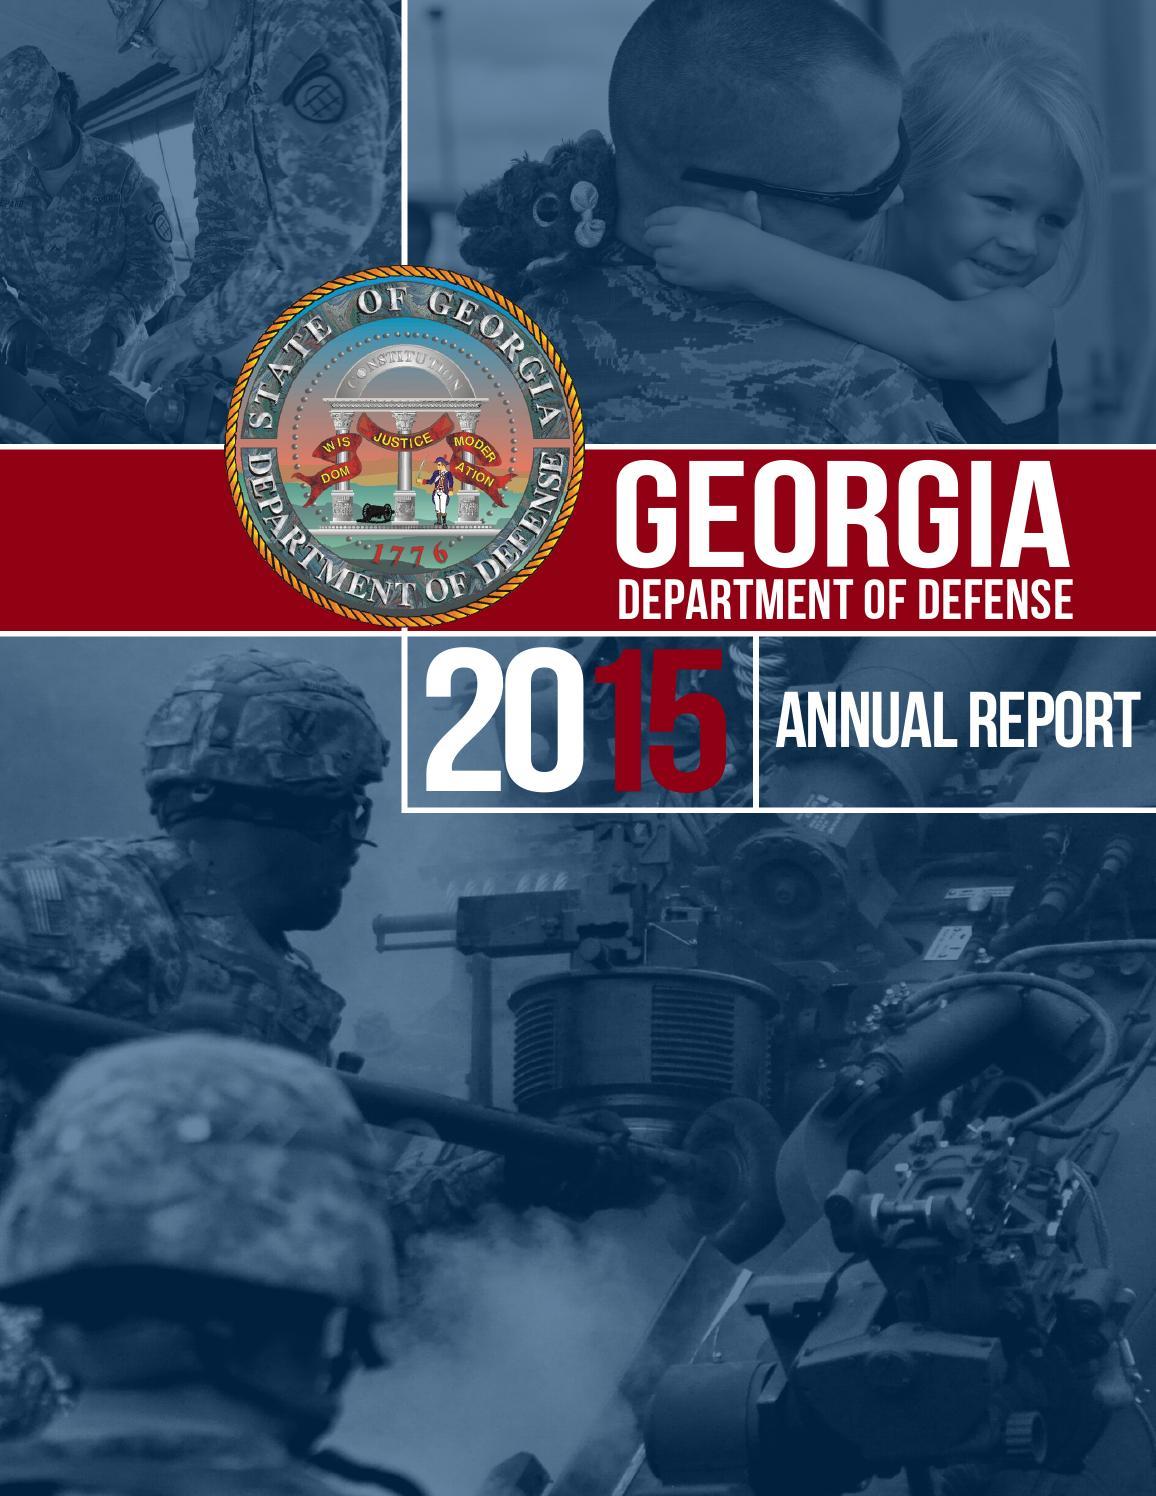 2015 Georgia Department of Defense Annual Report by Georgia